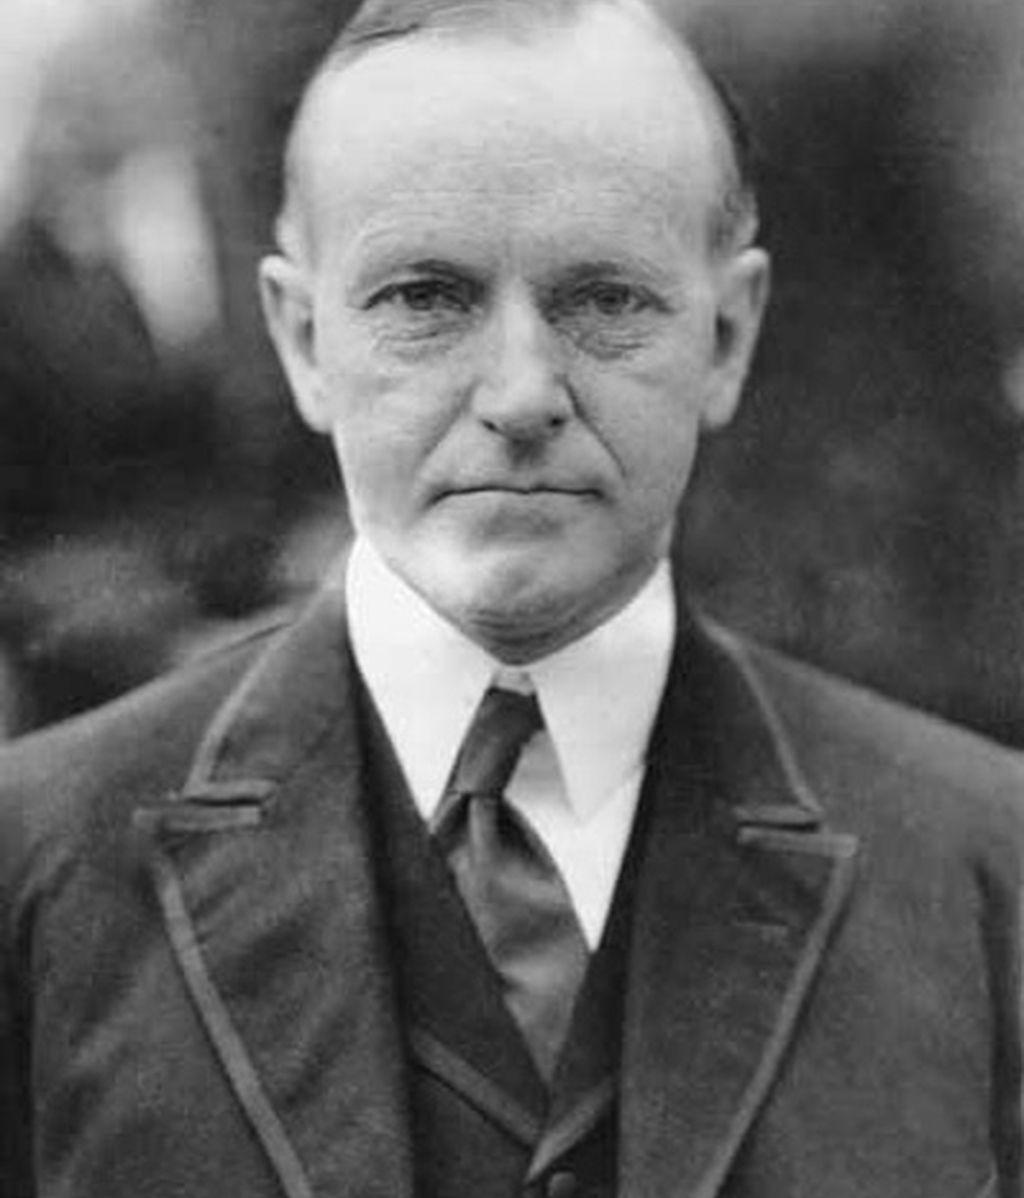 Calvin Coolidge (1923-1929)